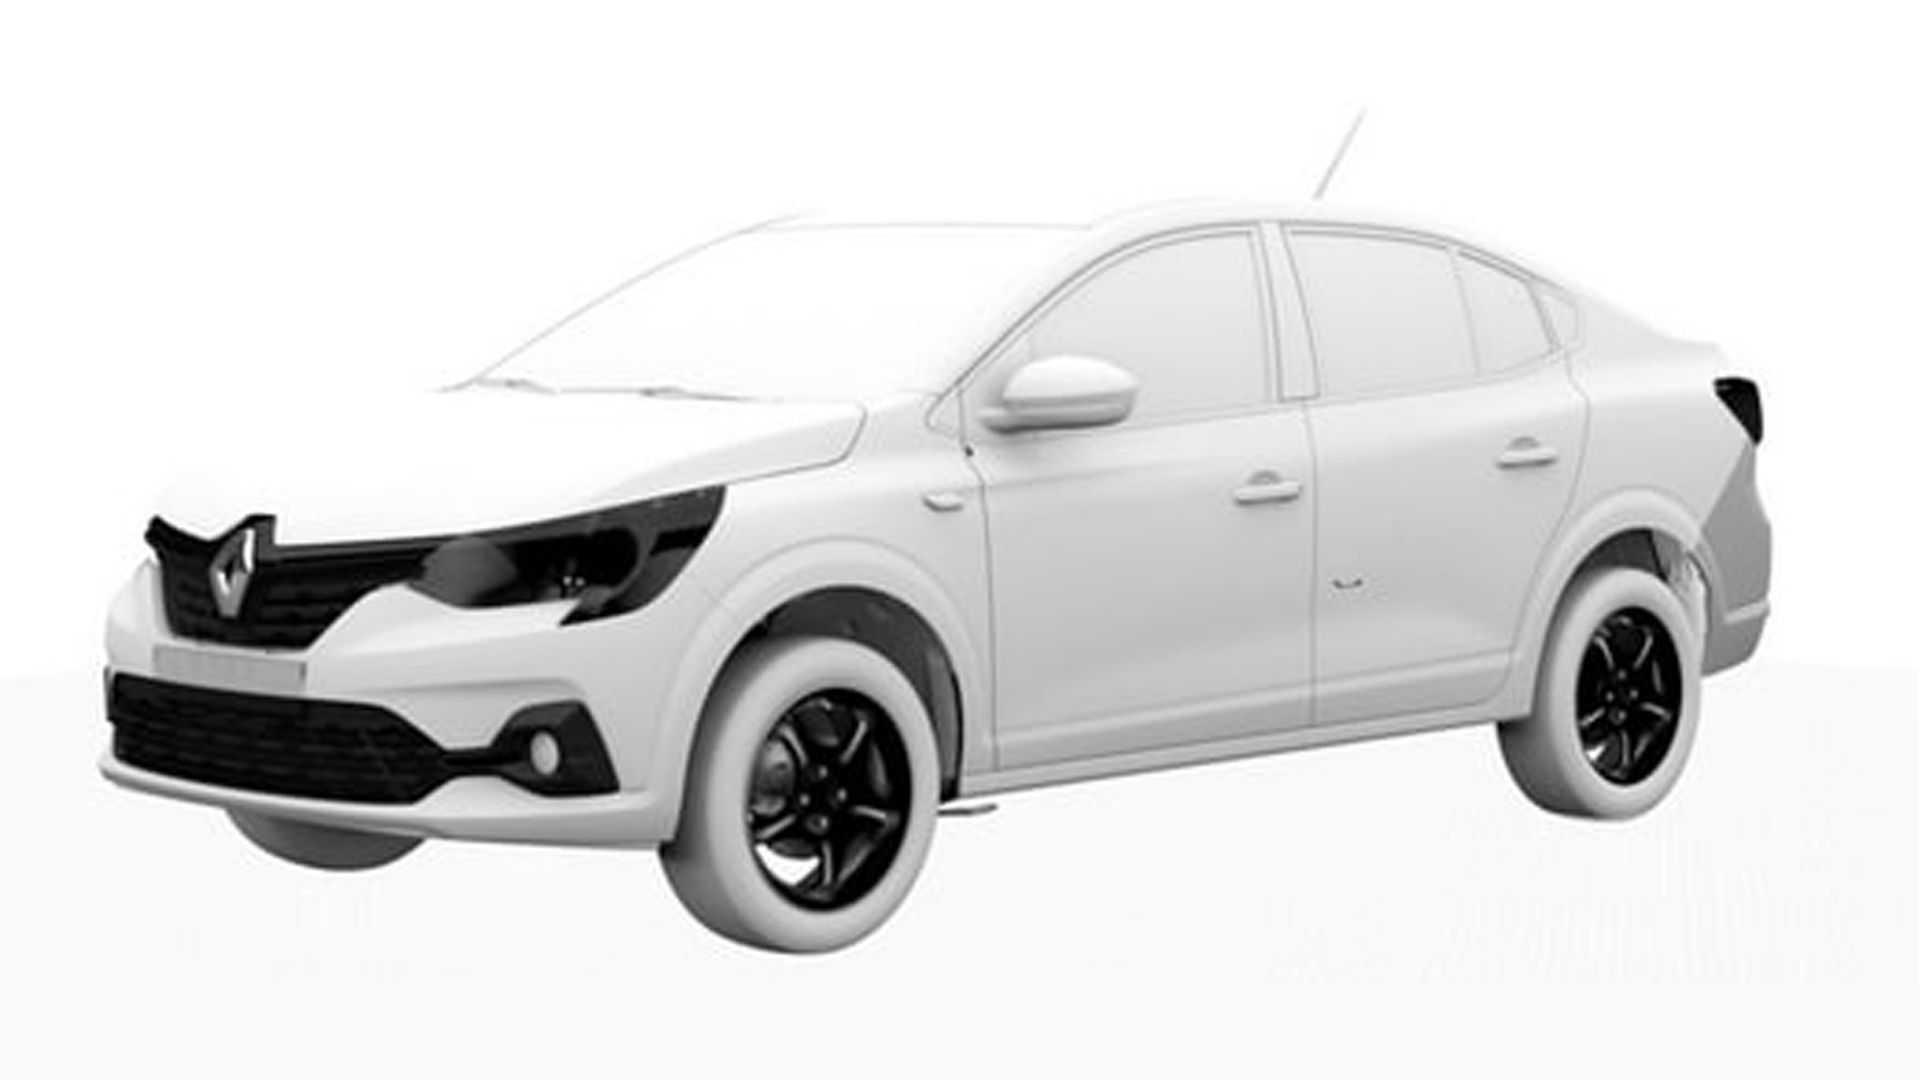 Renault Taliant patente